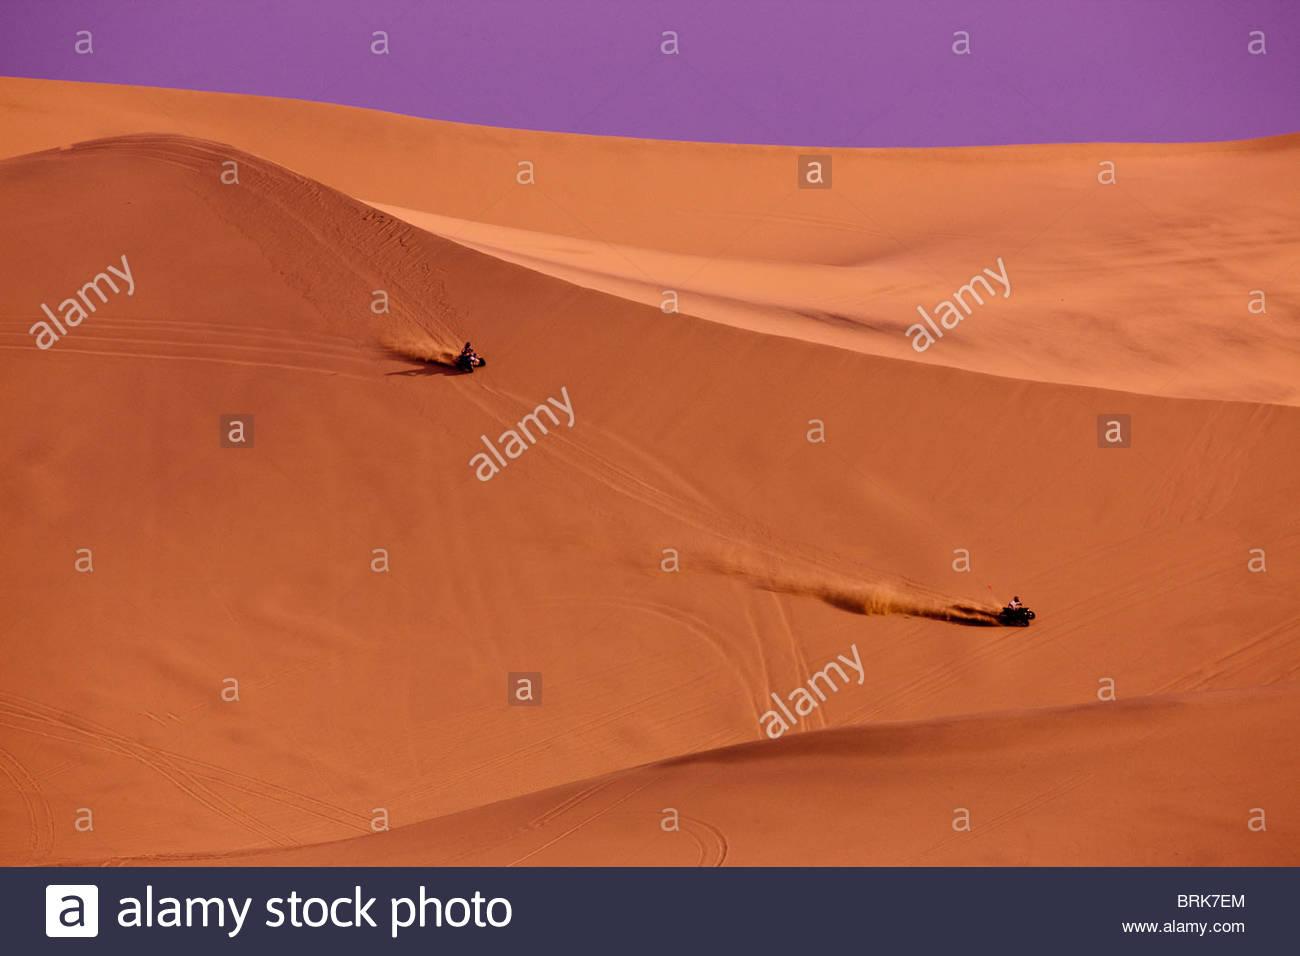 Friends riding quadbikes on desert dunes. - Stock Image